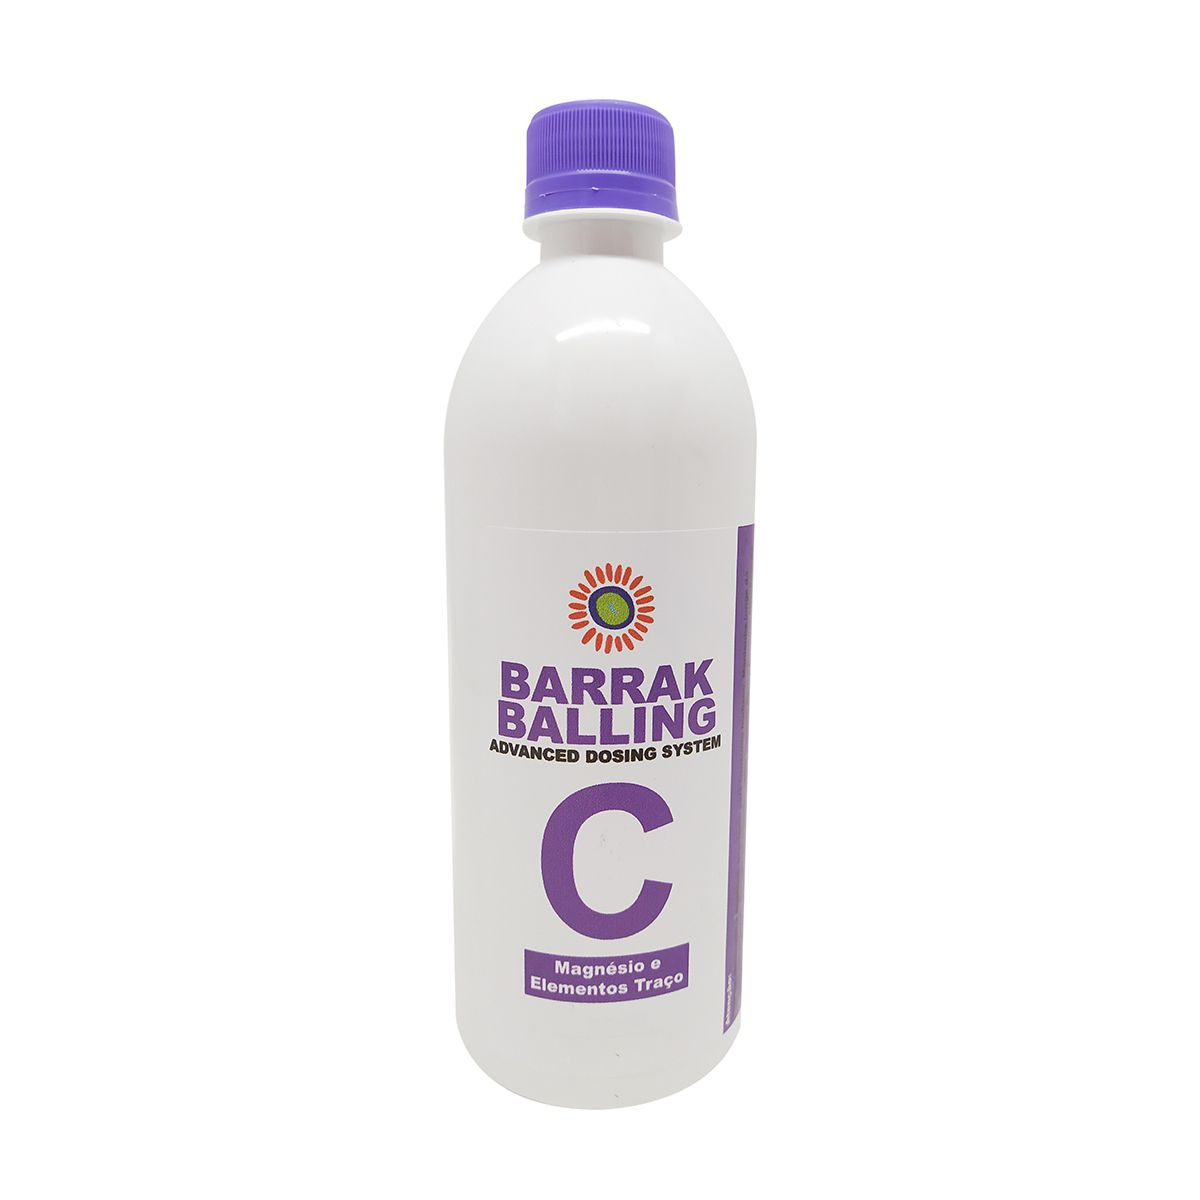 Balling Barrak C Magnésio e Elementos Traço - 1 Litro